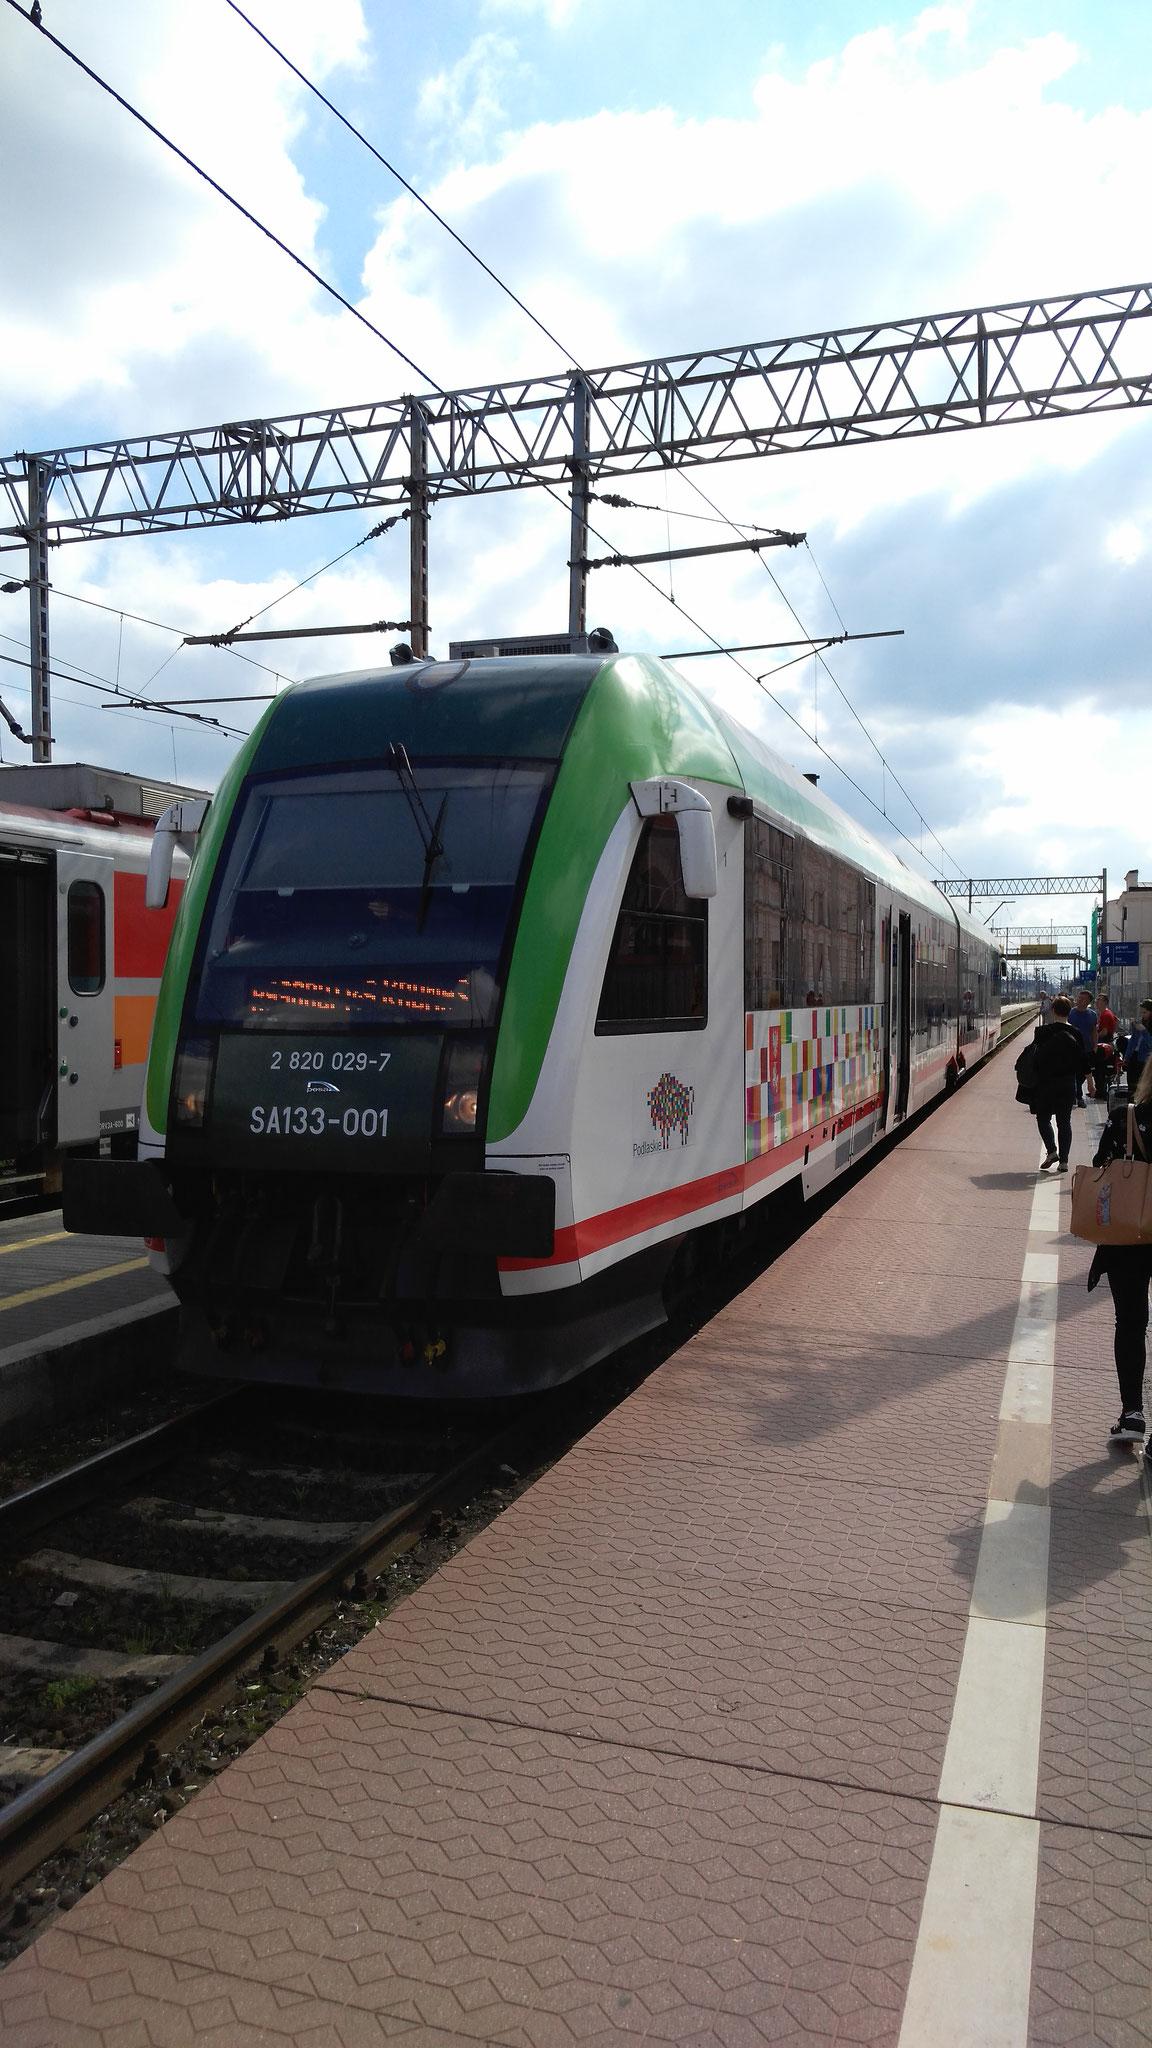 Train Bialystok (Pologne) - Kaunas (Lituanie)